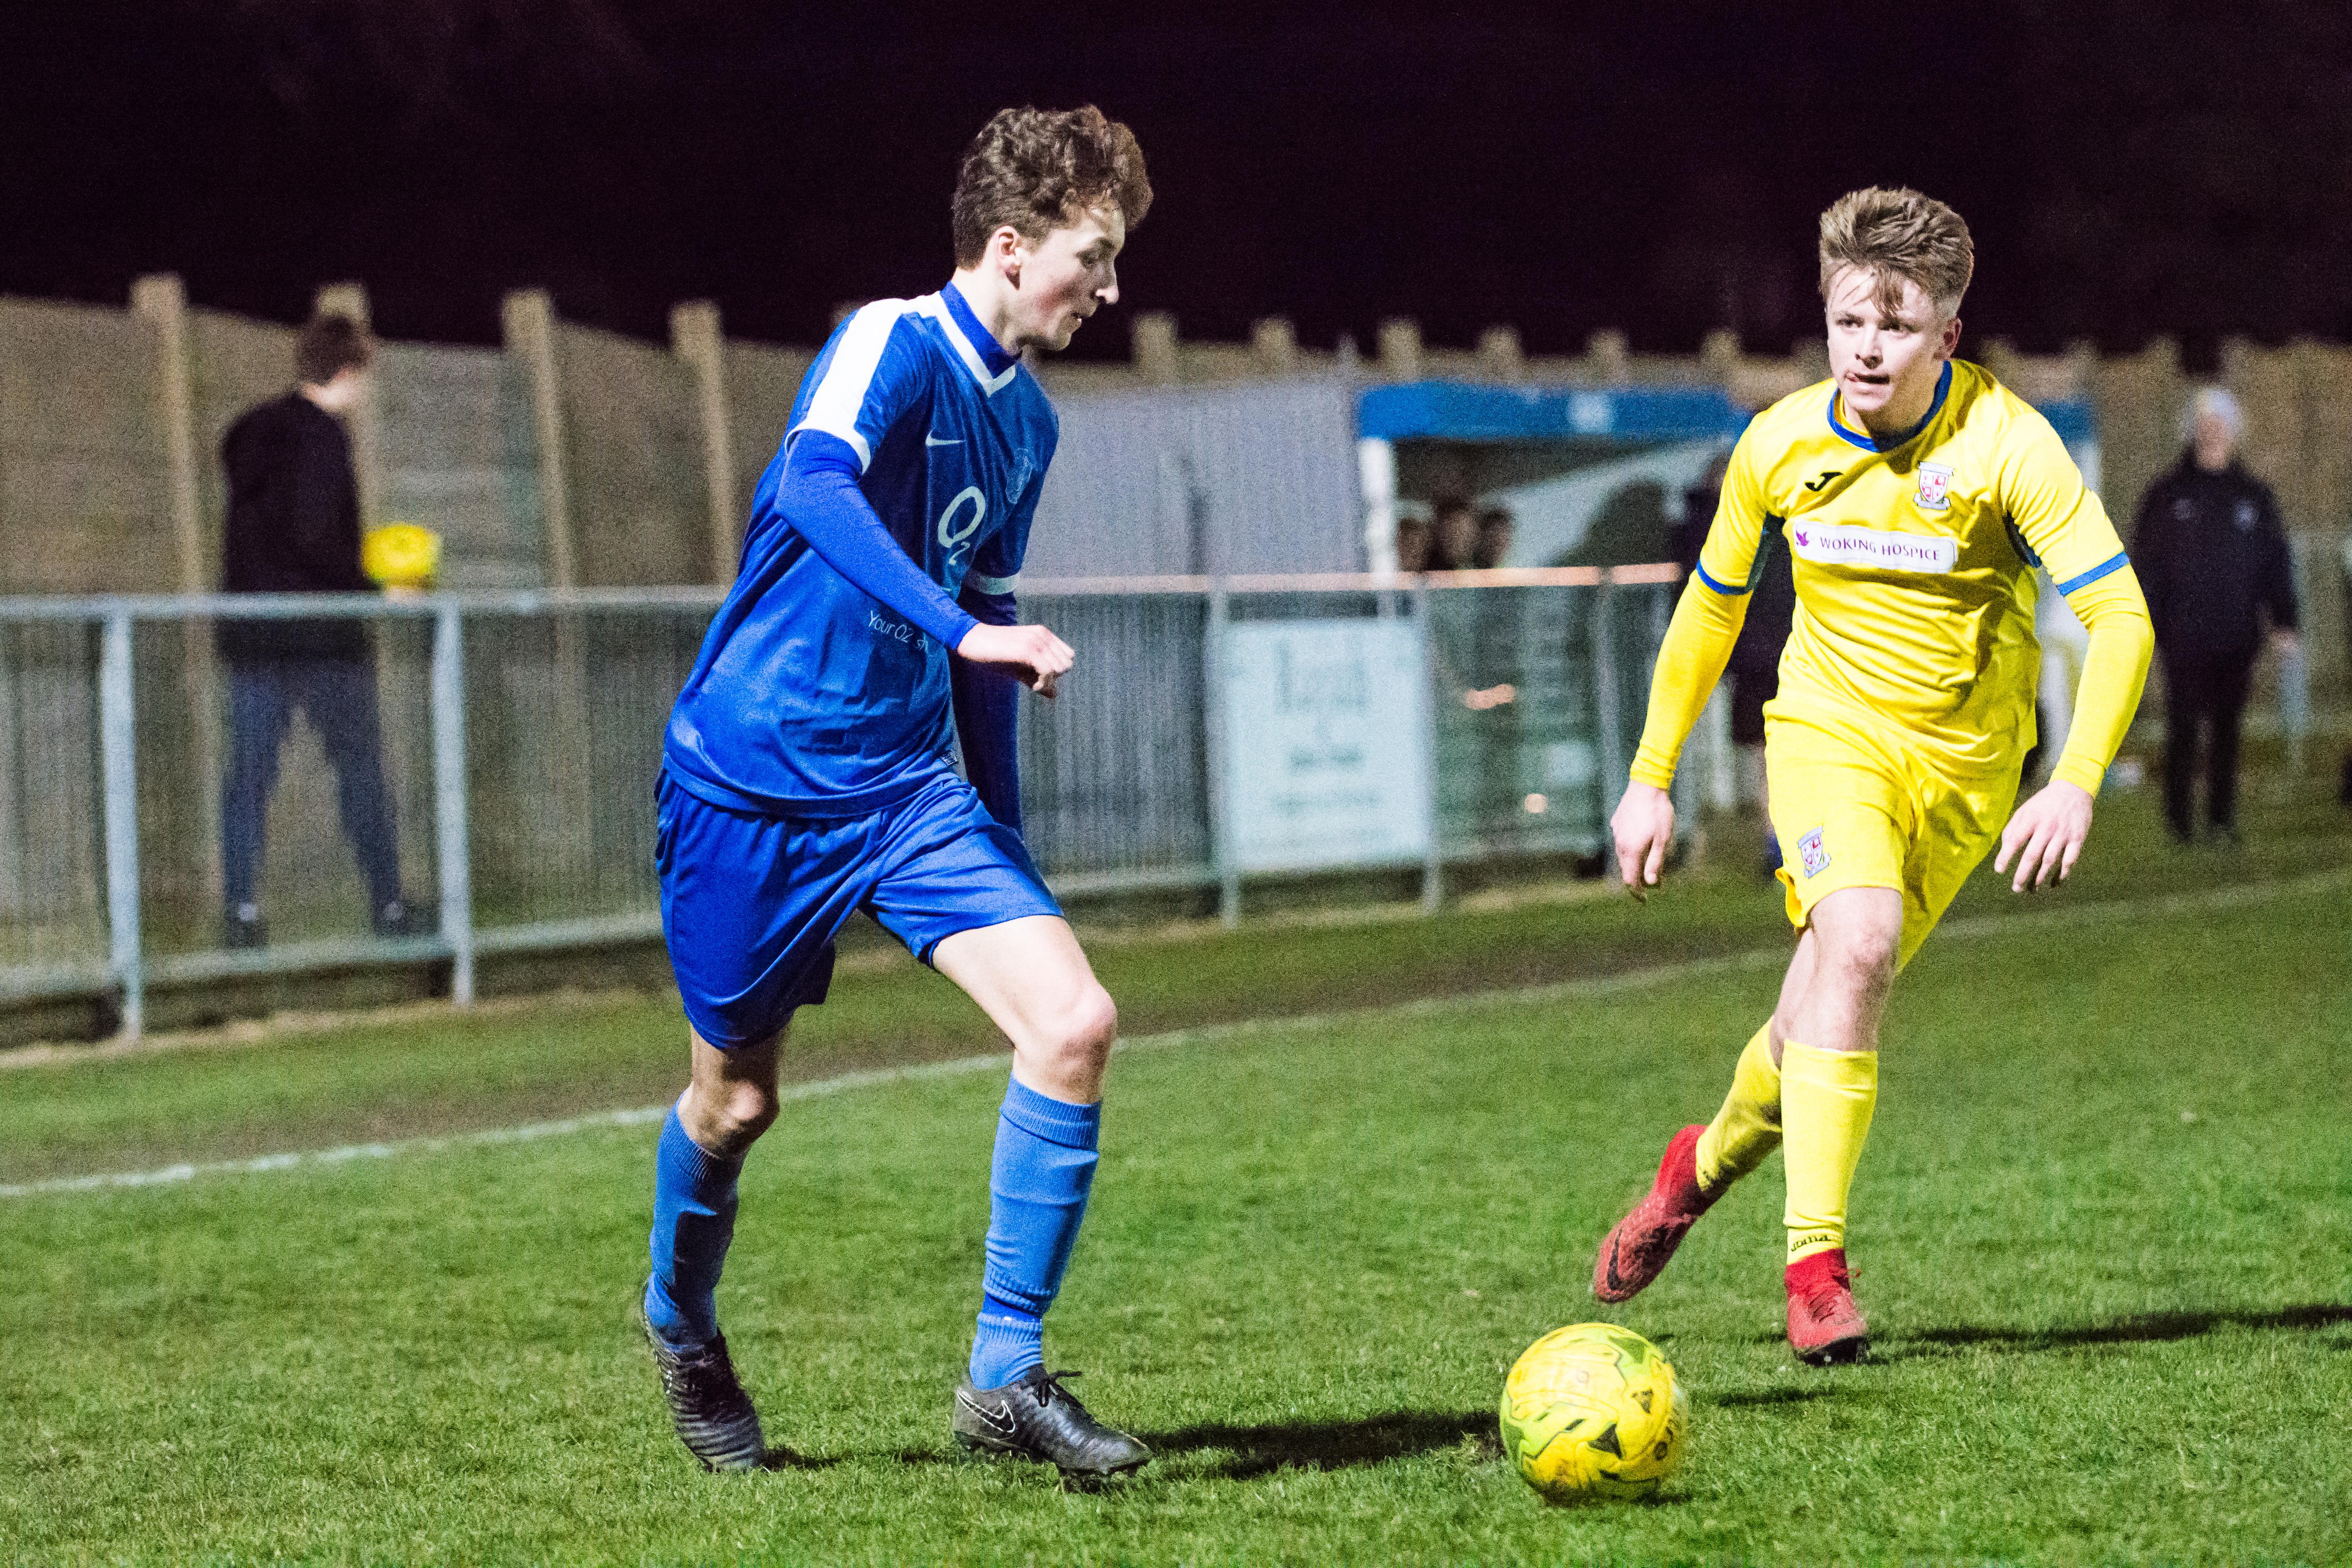 DAVID_JEFFERY Shoreham FC U18s vs Woking FC Academy 22.03.18 82